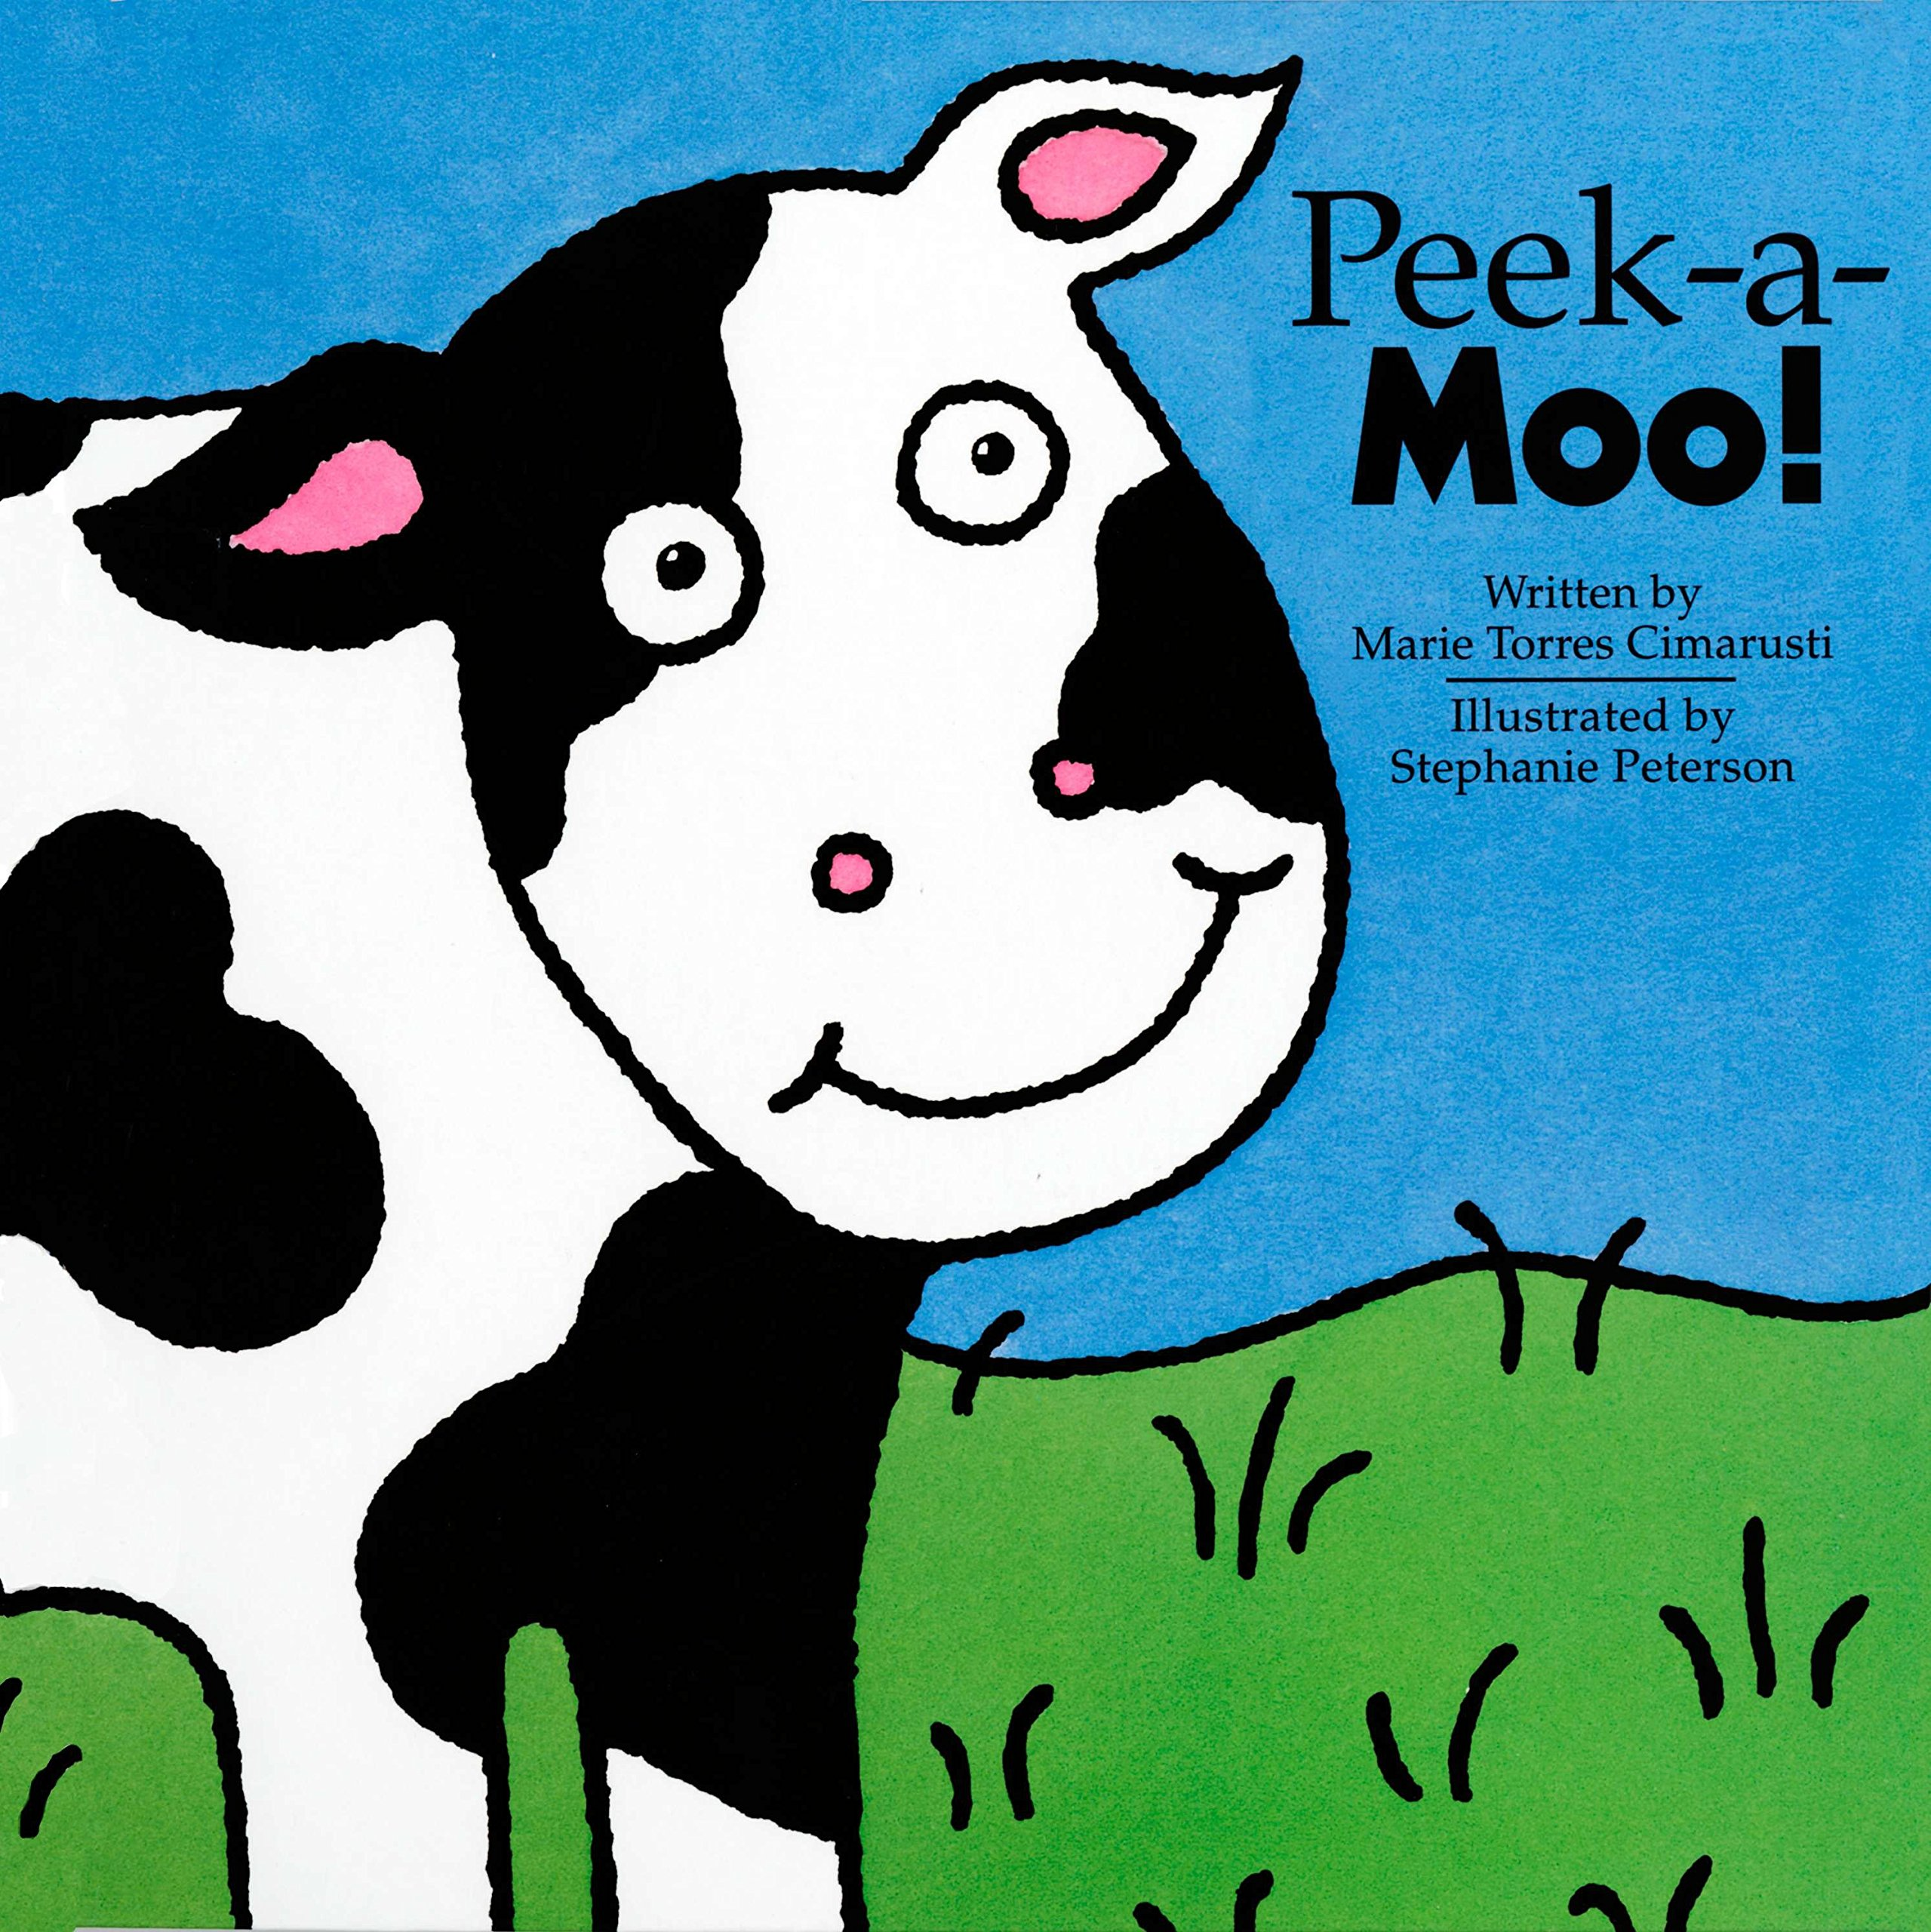 Peek-a-Moo! by Dutton Juvenile (Image #1)